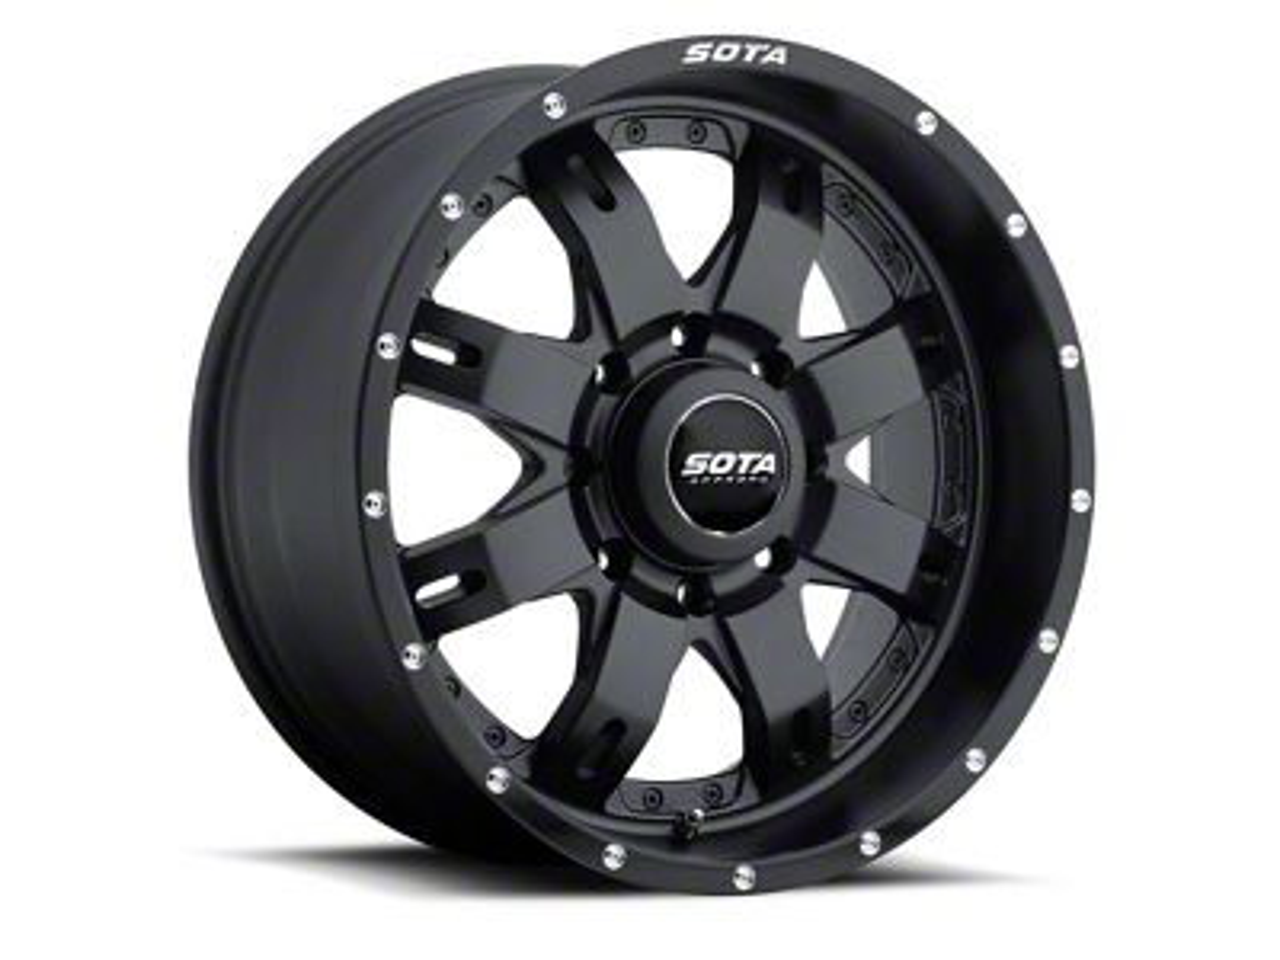 SOTA Off Road R.E.P.R. 8 Stealth Black 8-Lug Wheel - 20x9 (06-08 RAM 1500 Mega Cab)